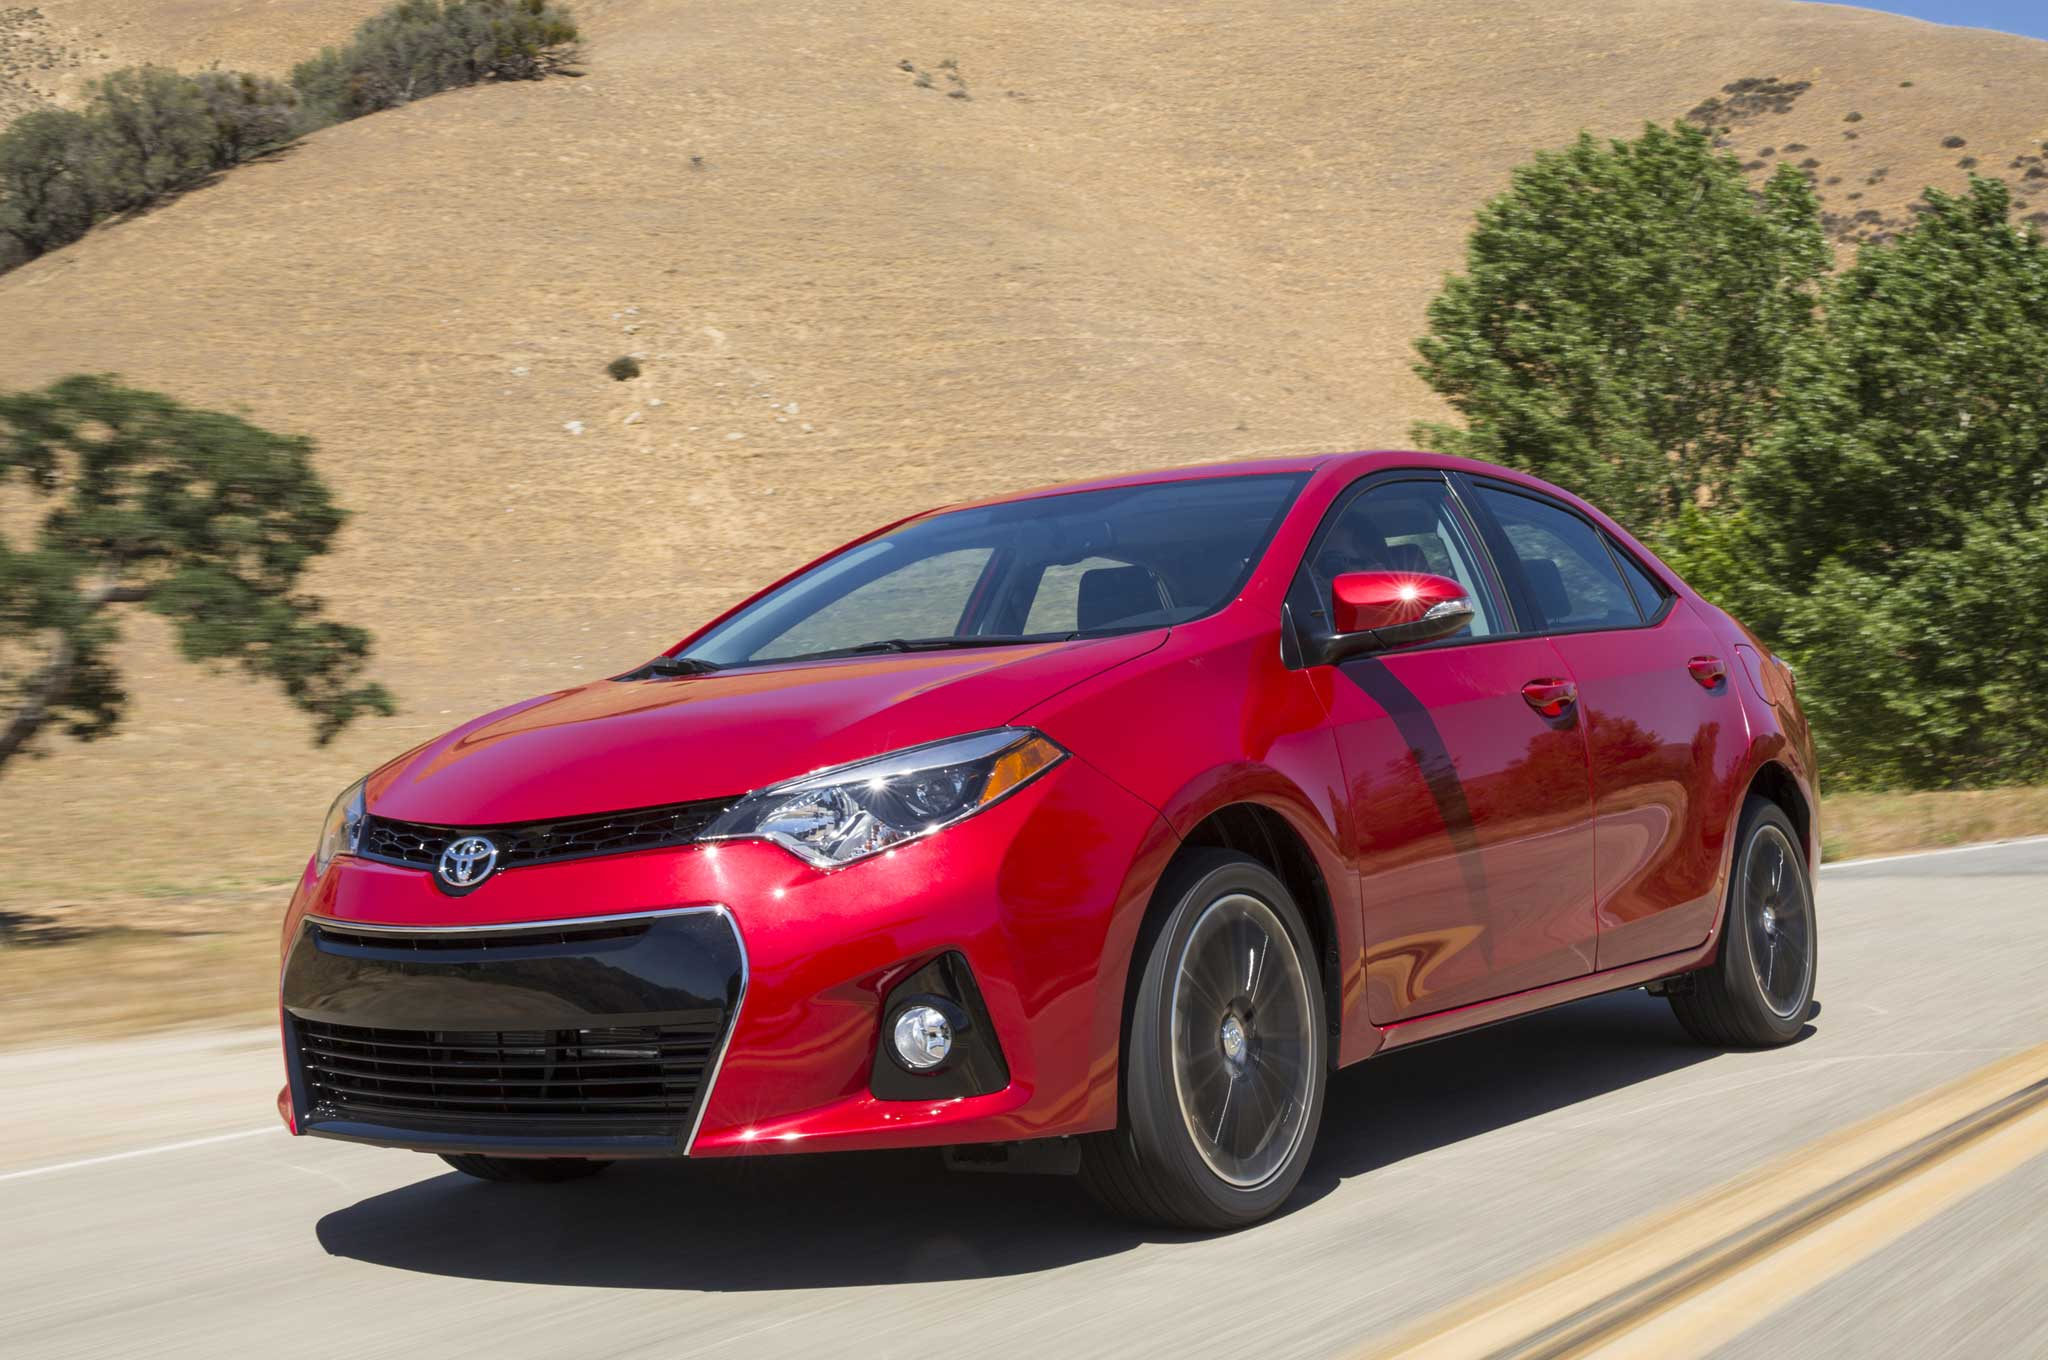 2014 Toyota Corolla S Front Three Quarter Motion1